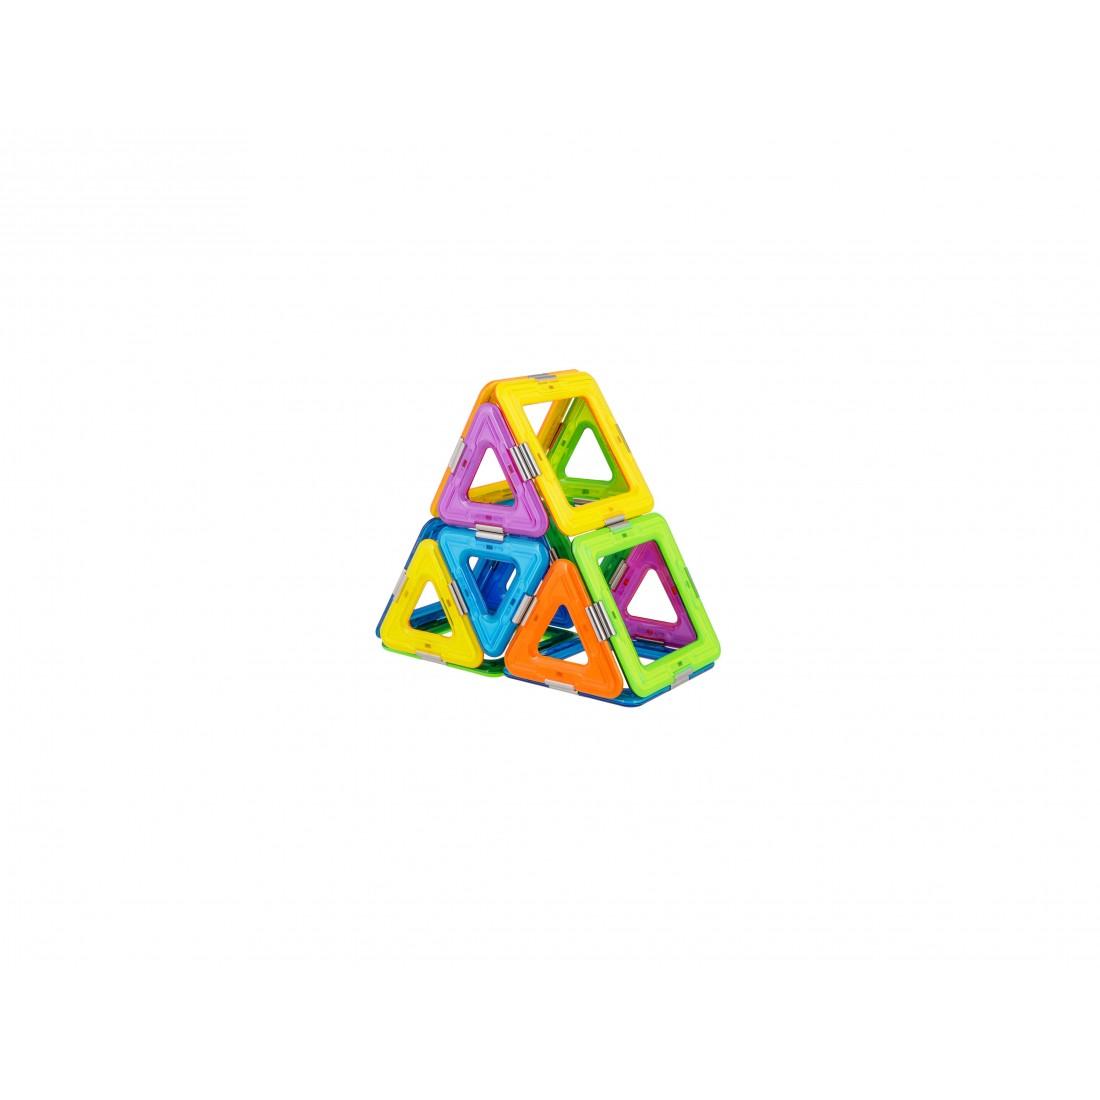 Magspace 26 Piese - Magic Ball Set - Joc Magnetic Educativ de Constructie 3D | Magspace